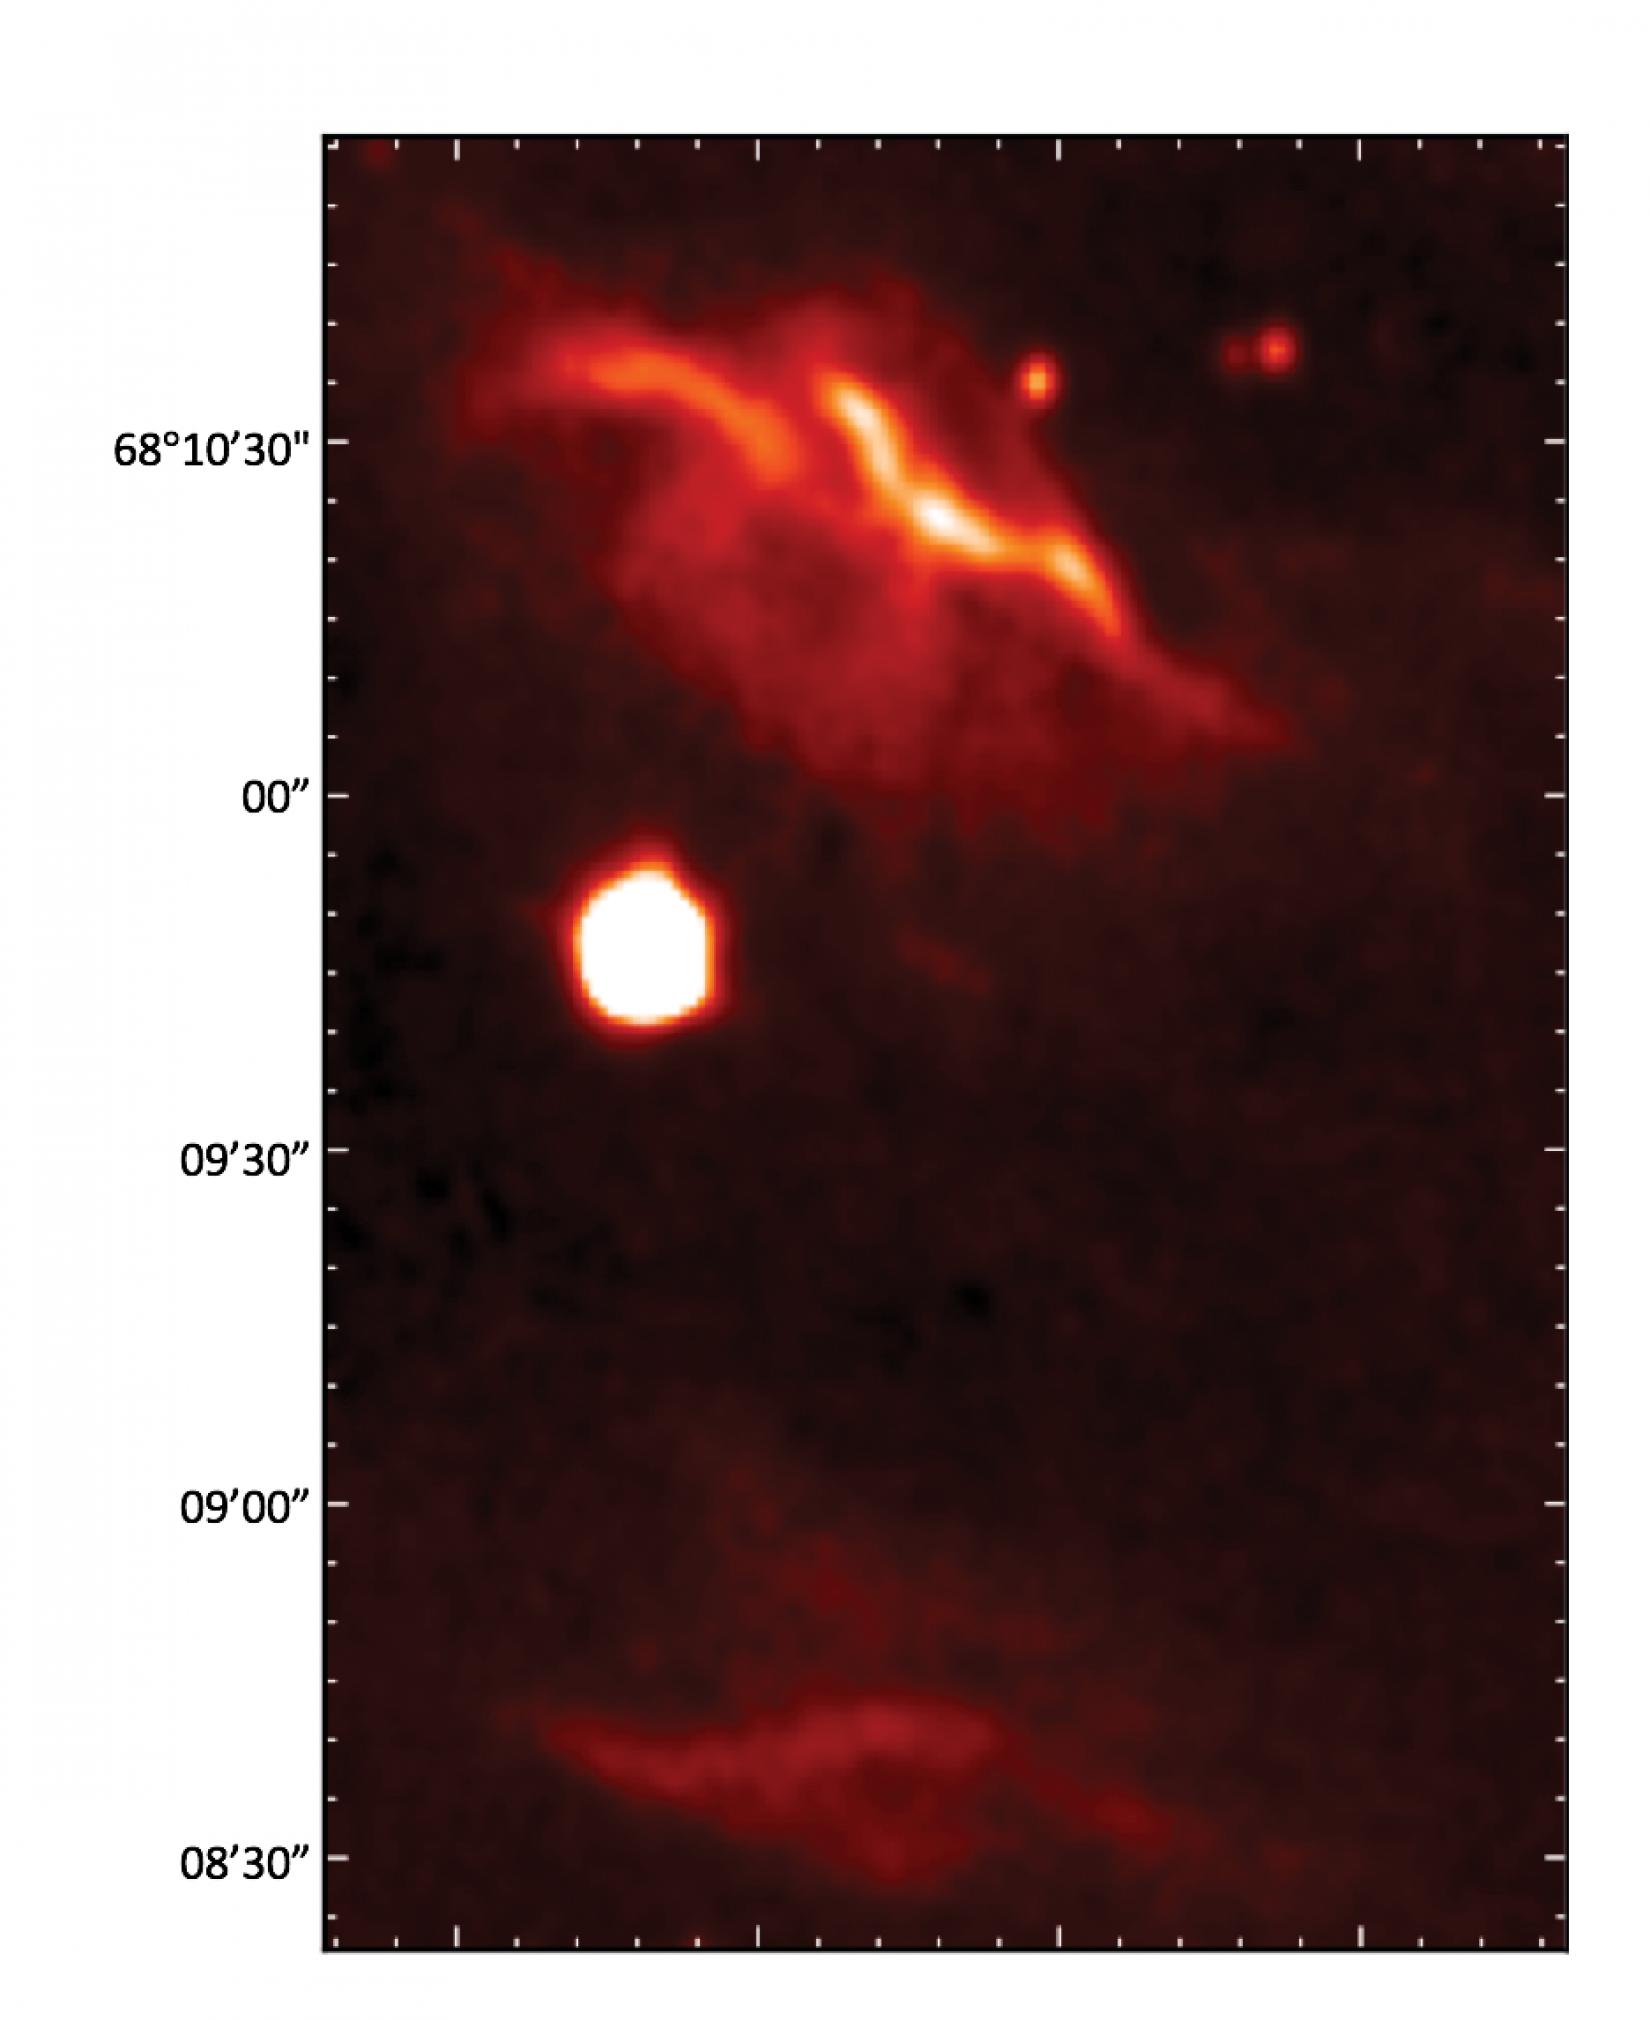 NGC 7023 at 3.3 μm